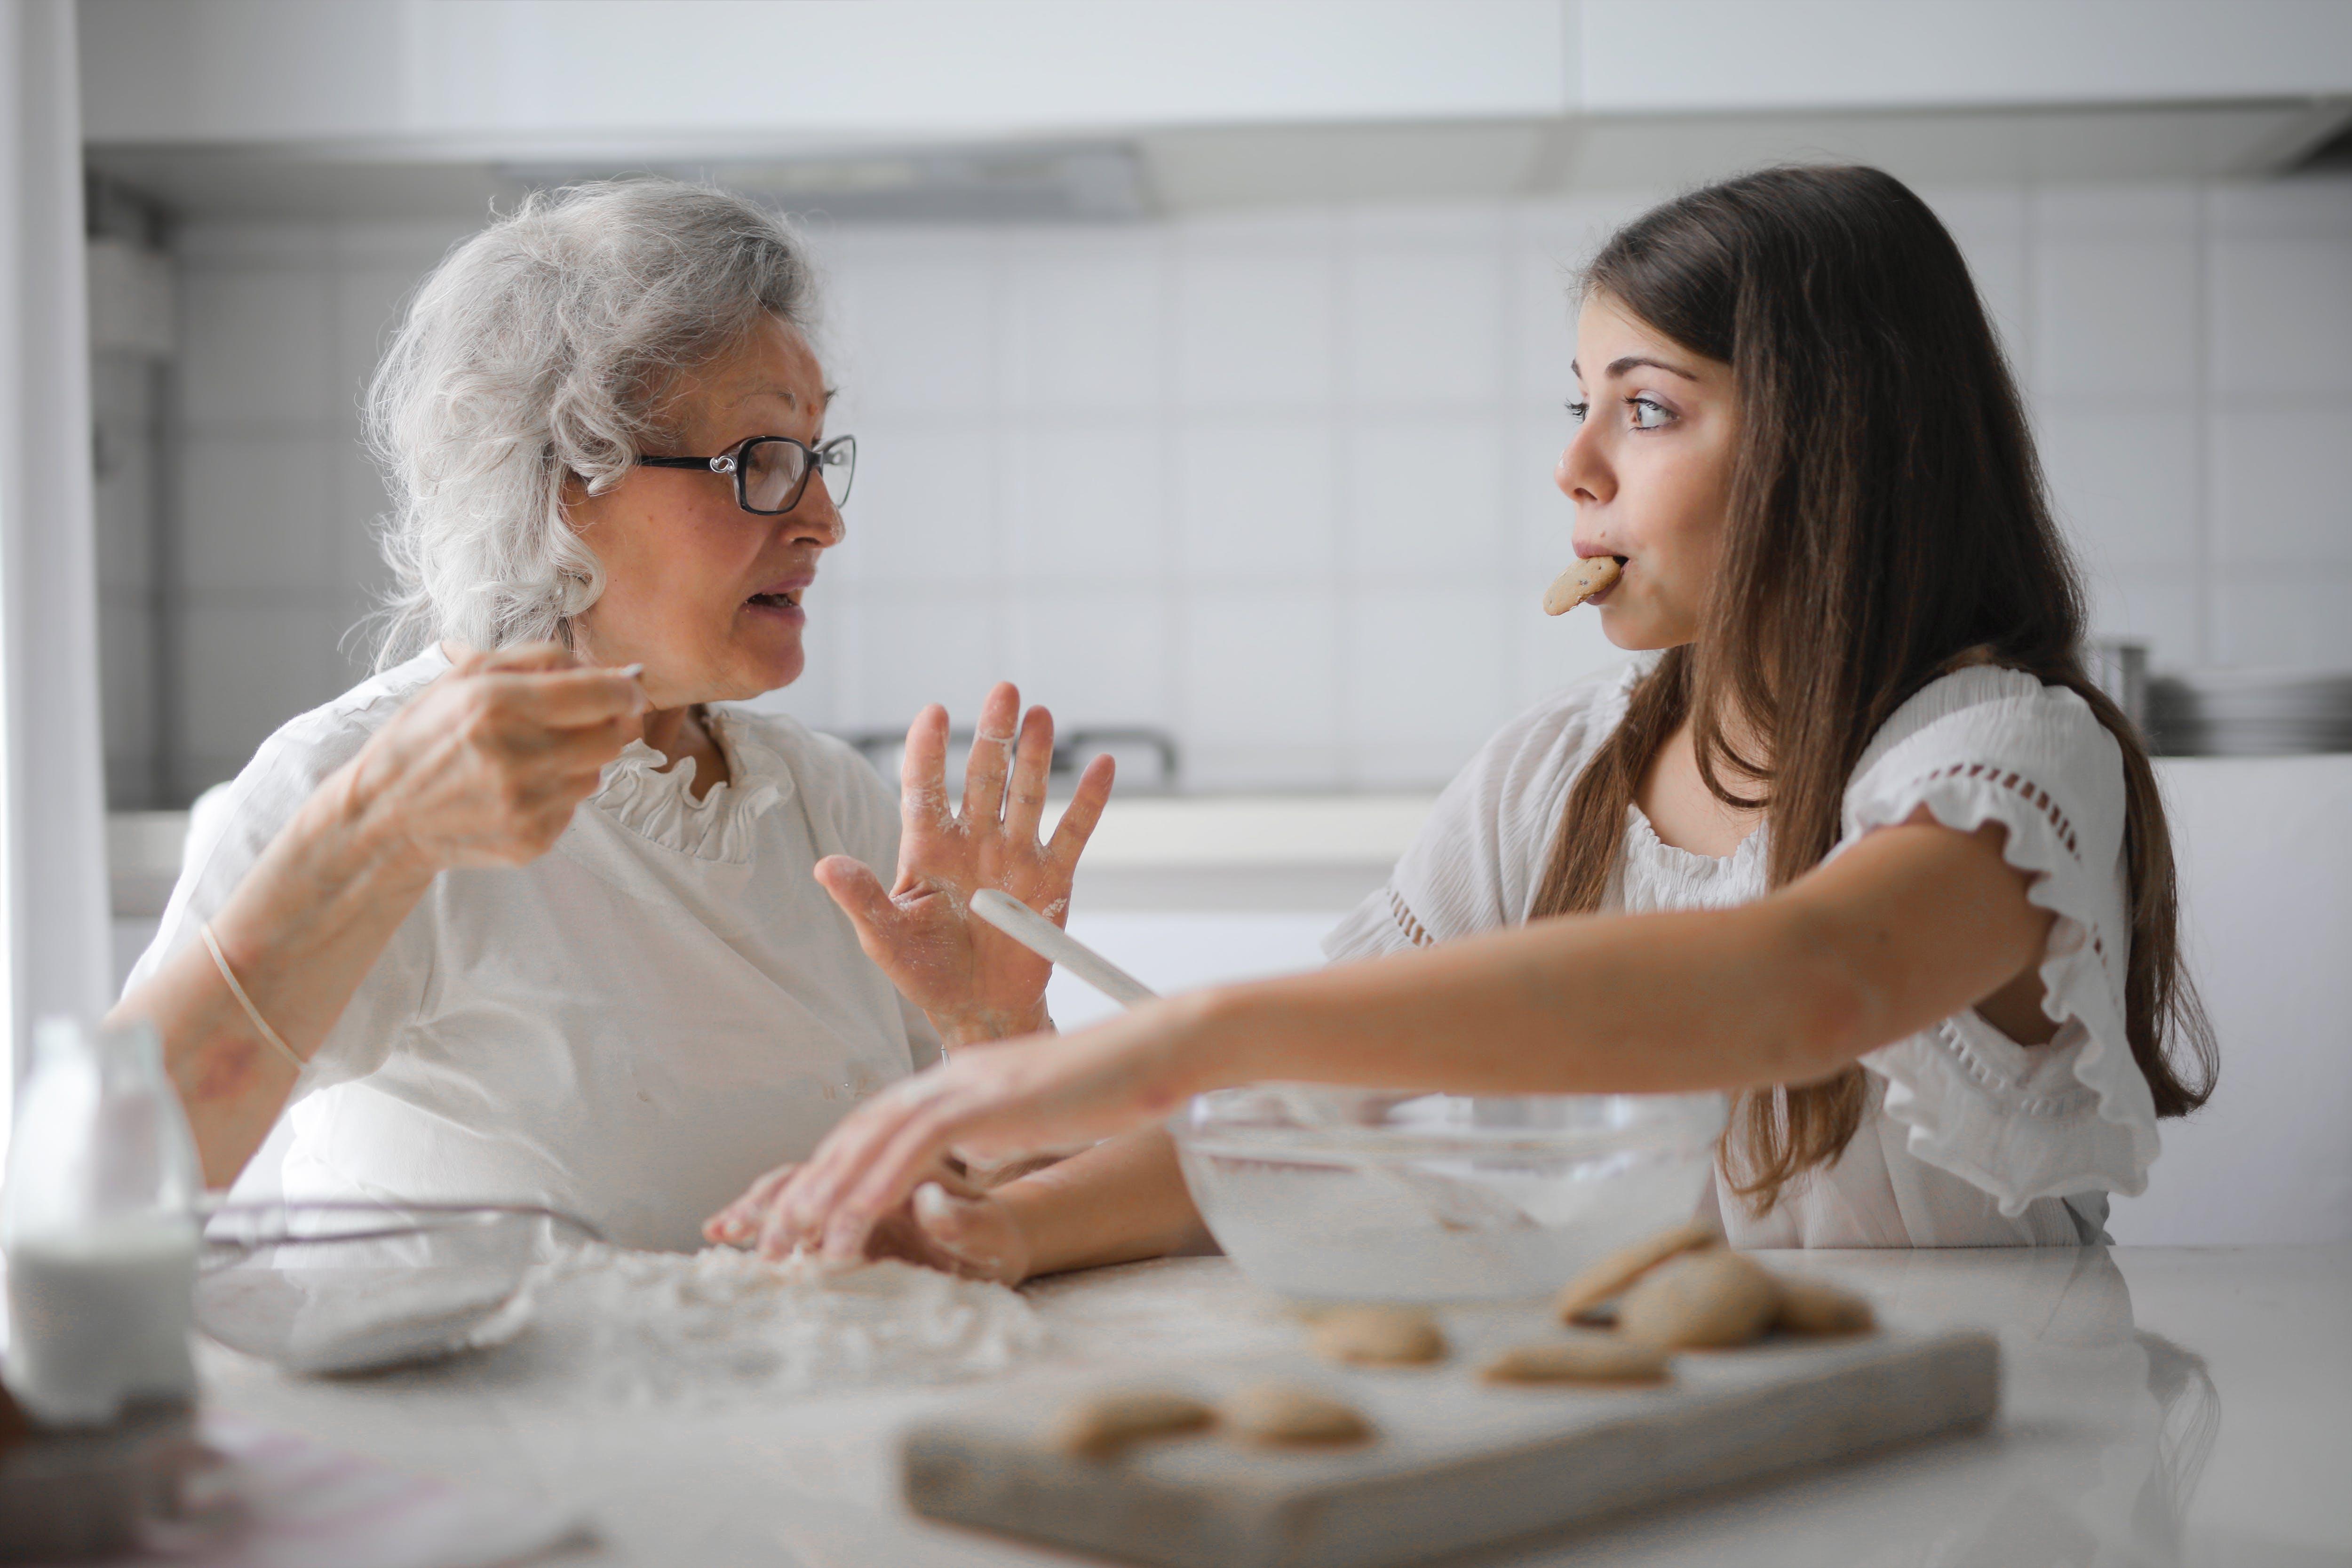 Grandmother and her granddaughter having interesting conversation. | Photo: Pexels